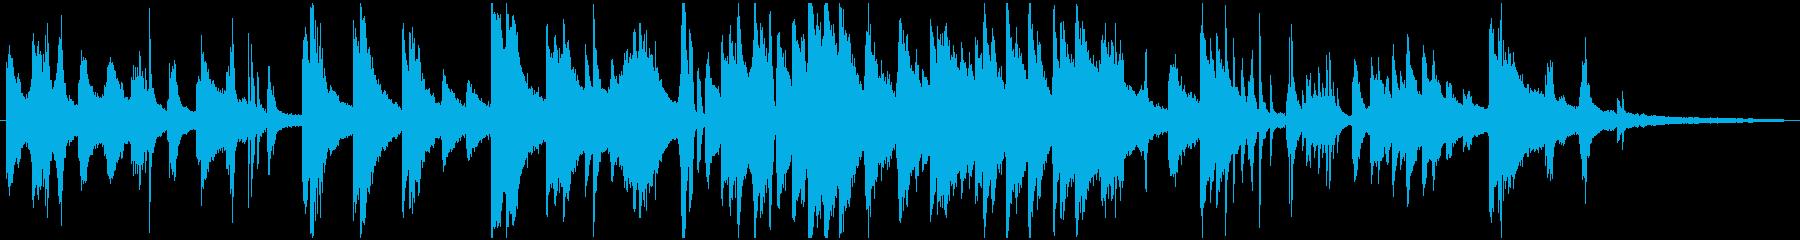 Jazzy Piano Improvisation 1の再生済みの波形